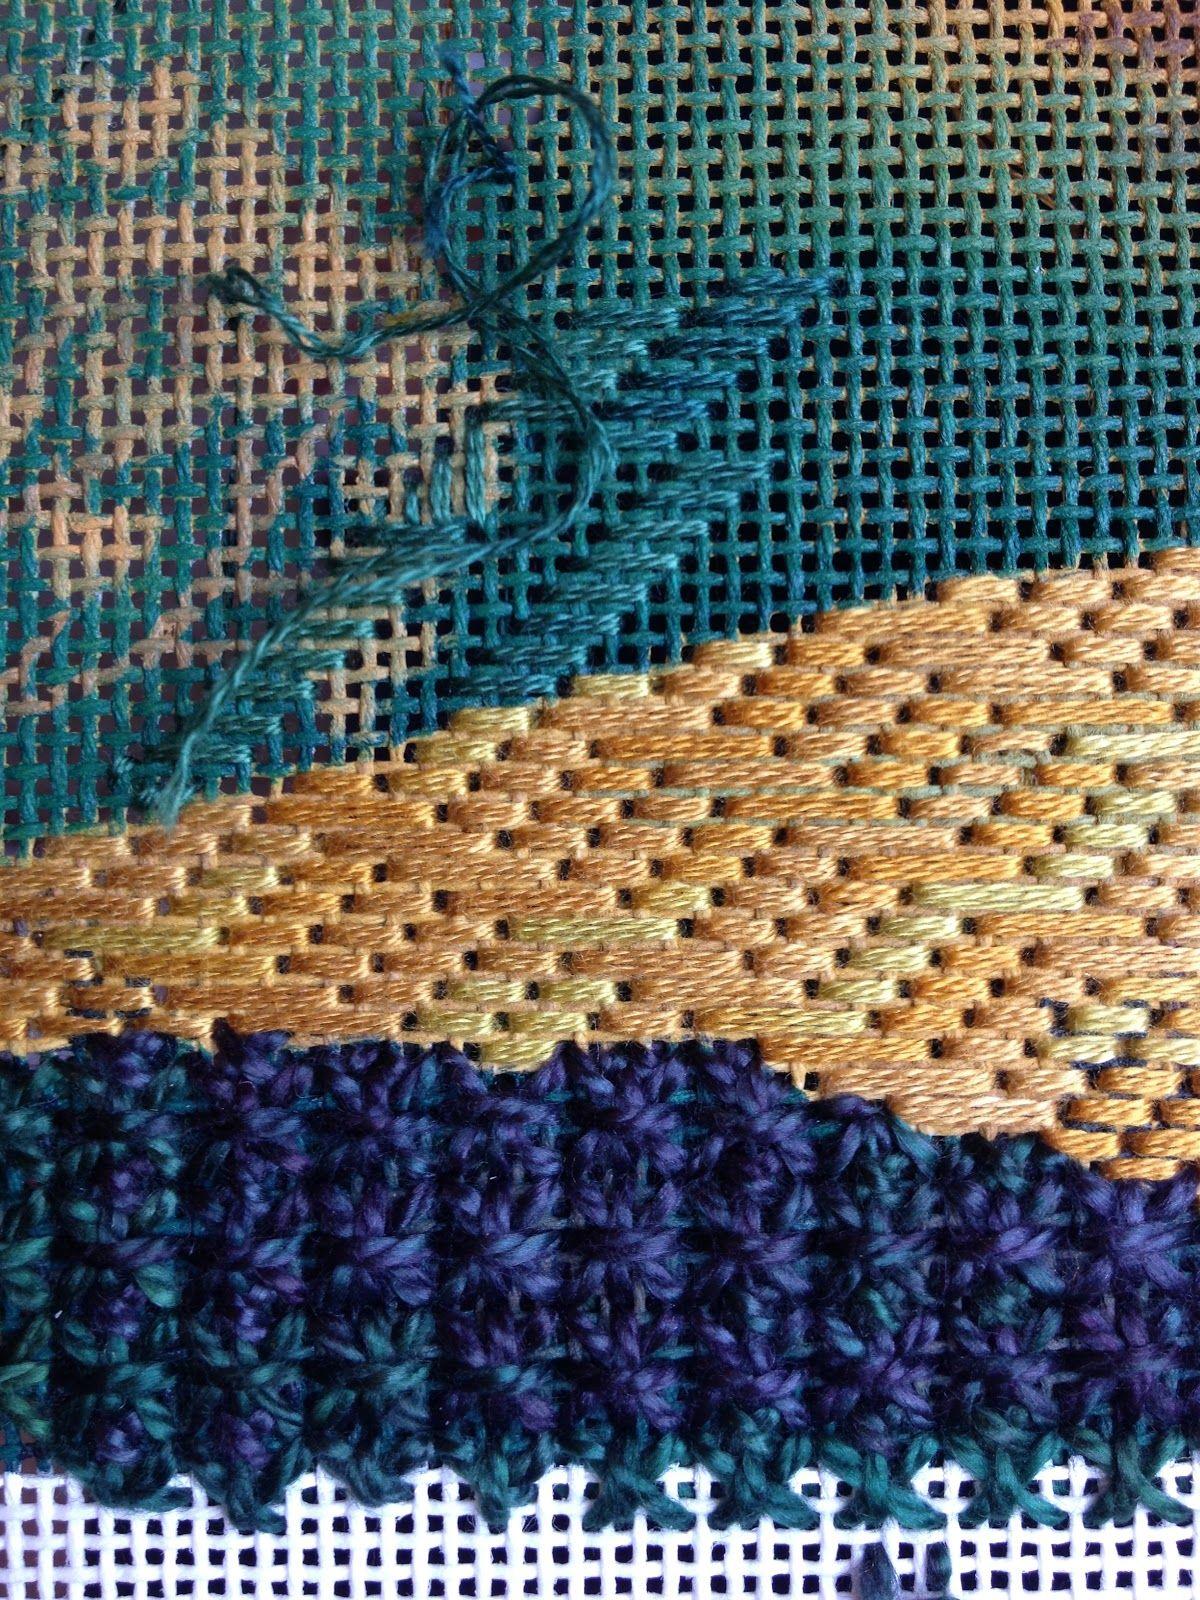 Victorian step stitch on the horizontal